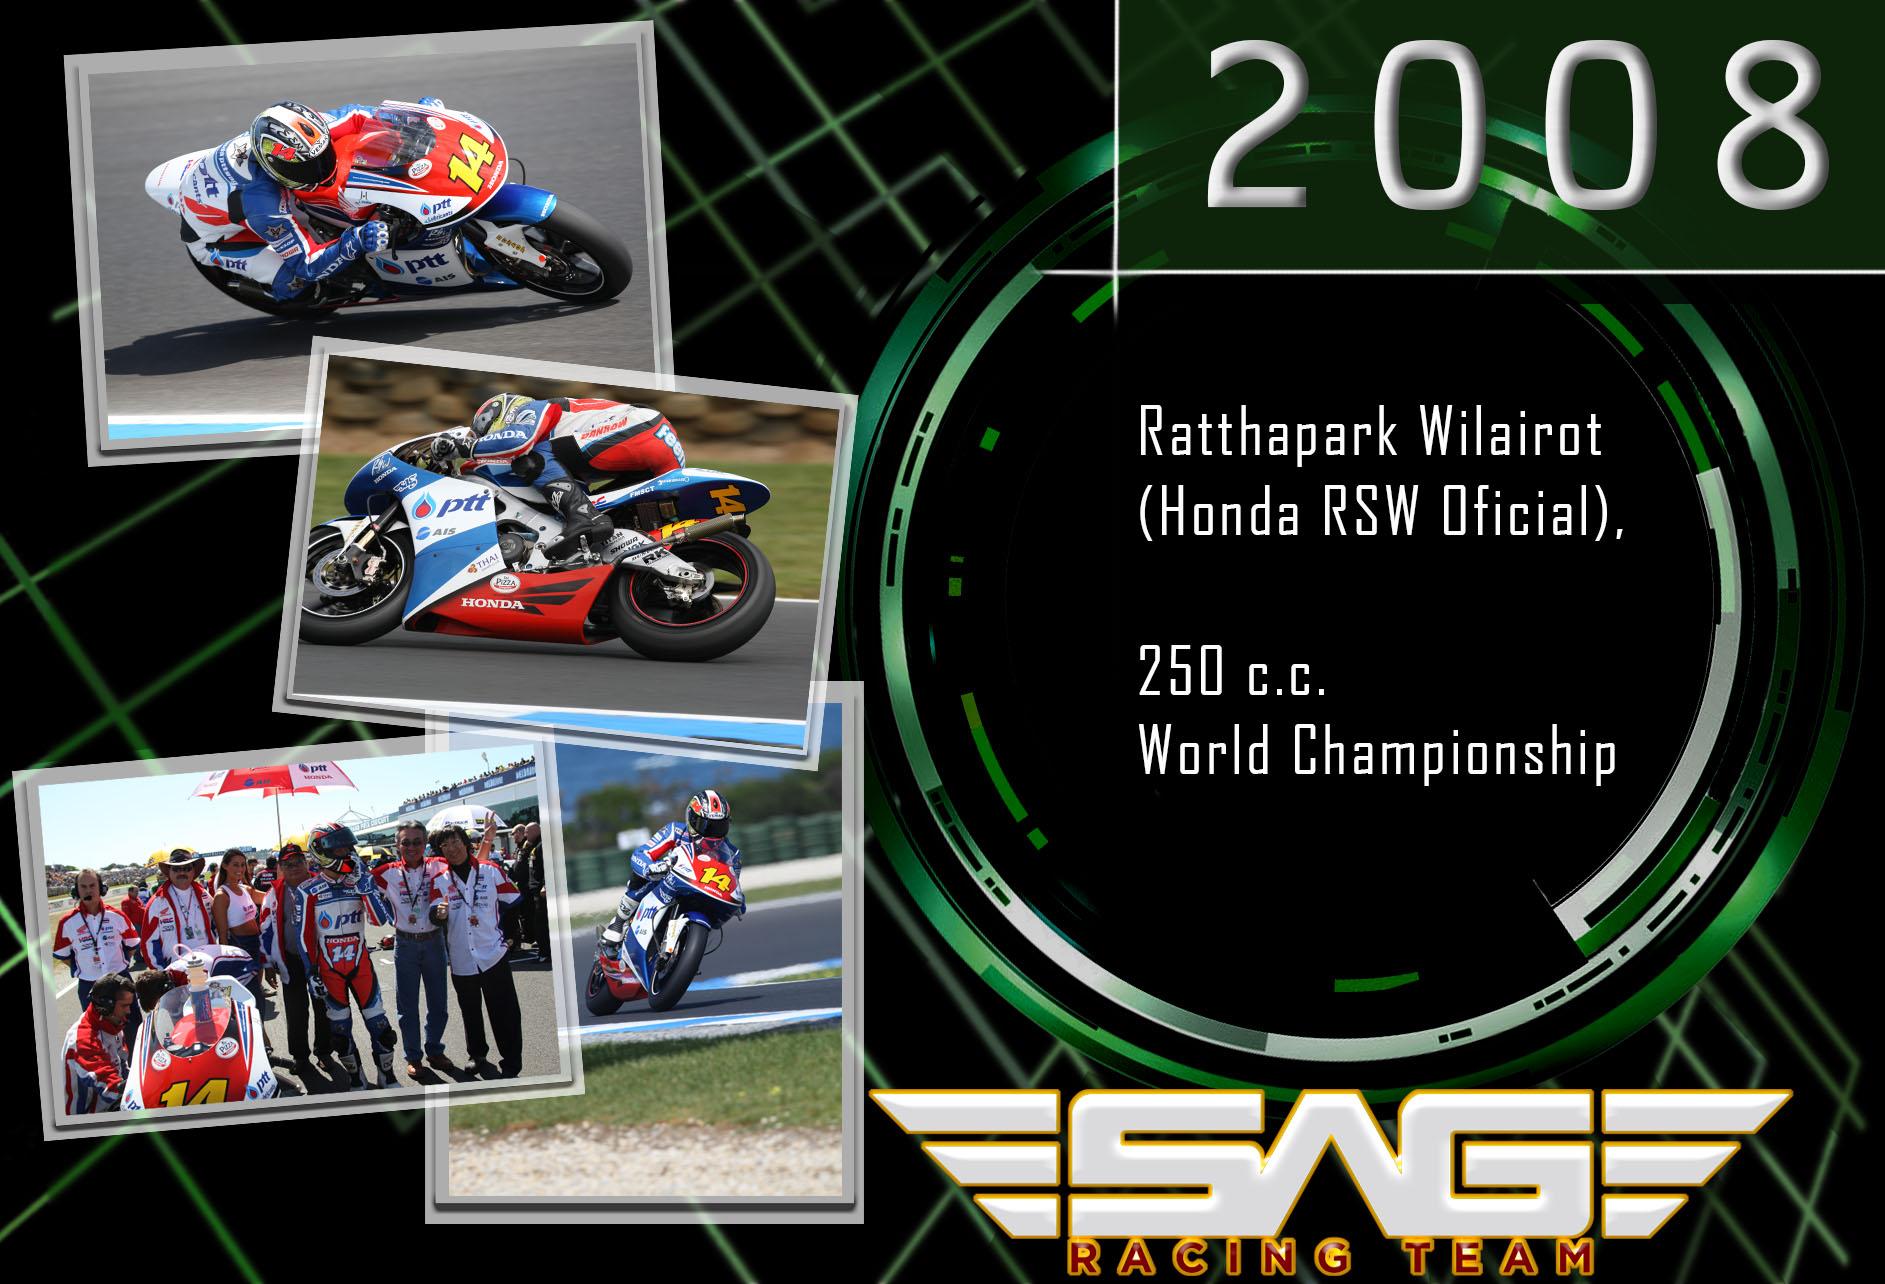 World Championship rider (250cc)